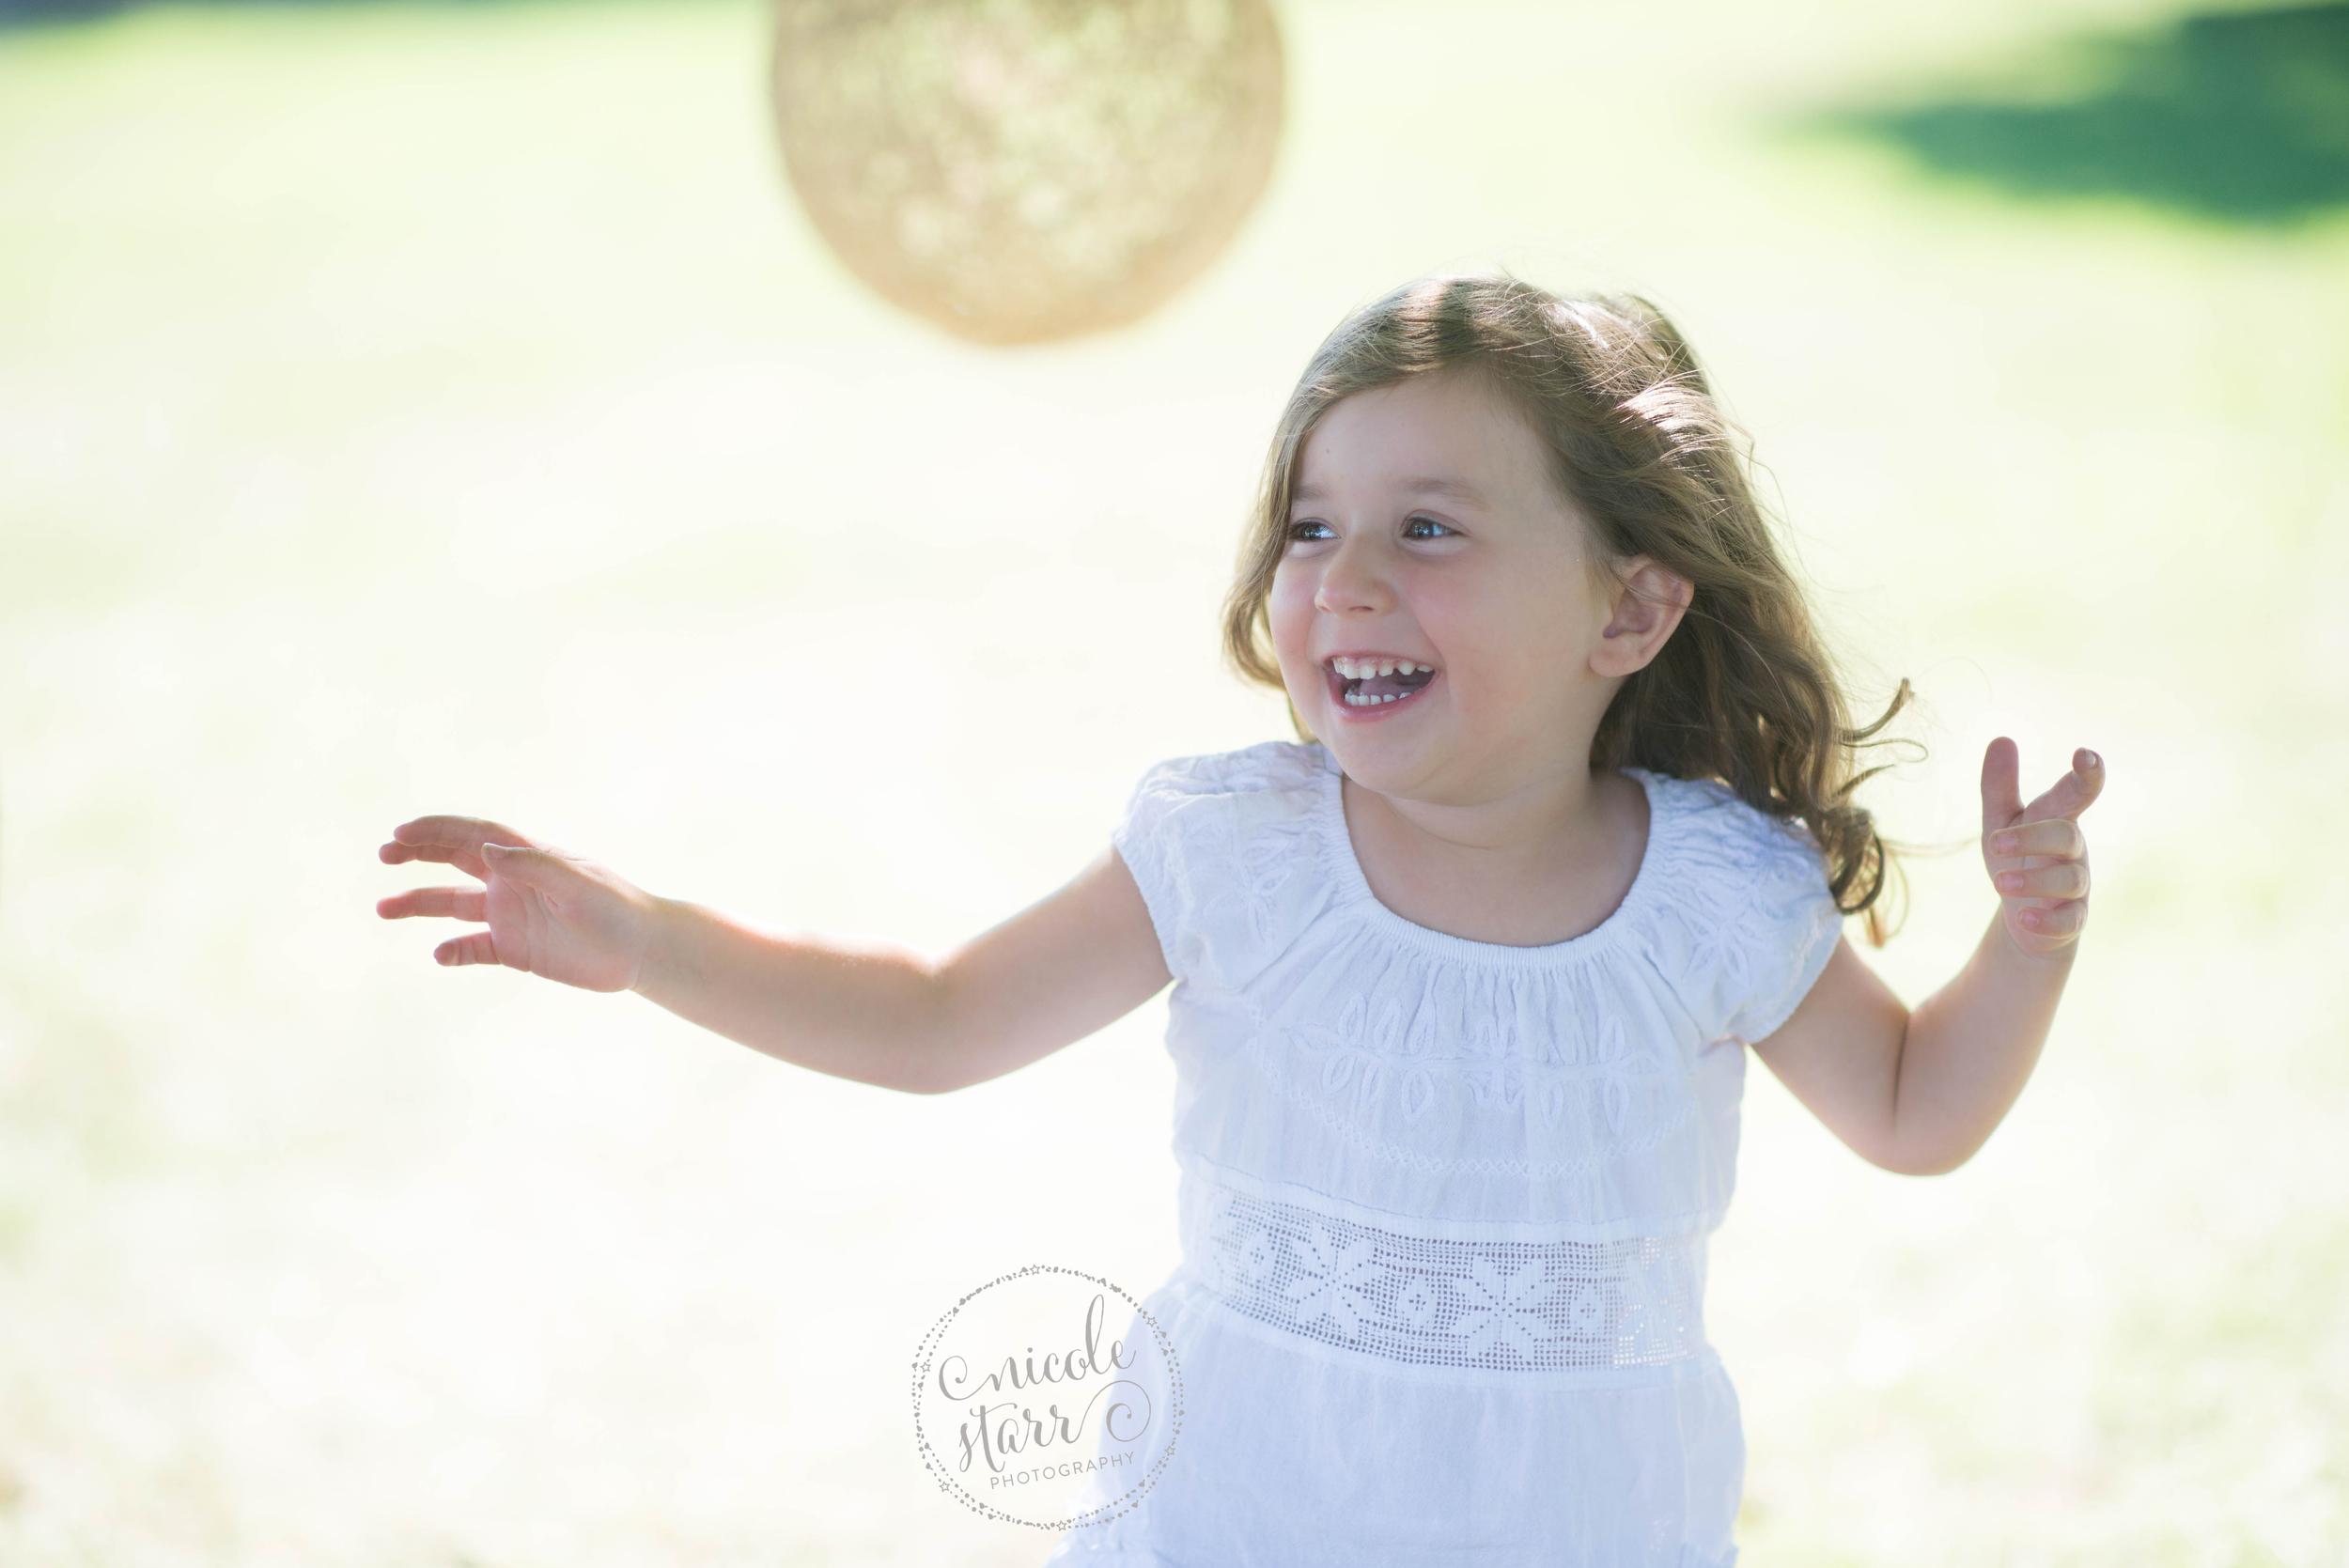 WM whimsical child photography 9